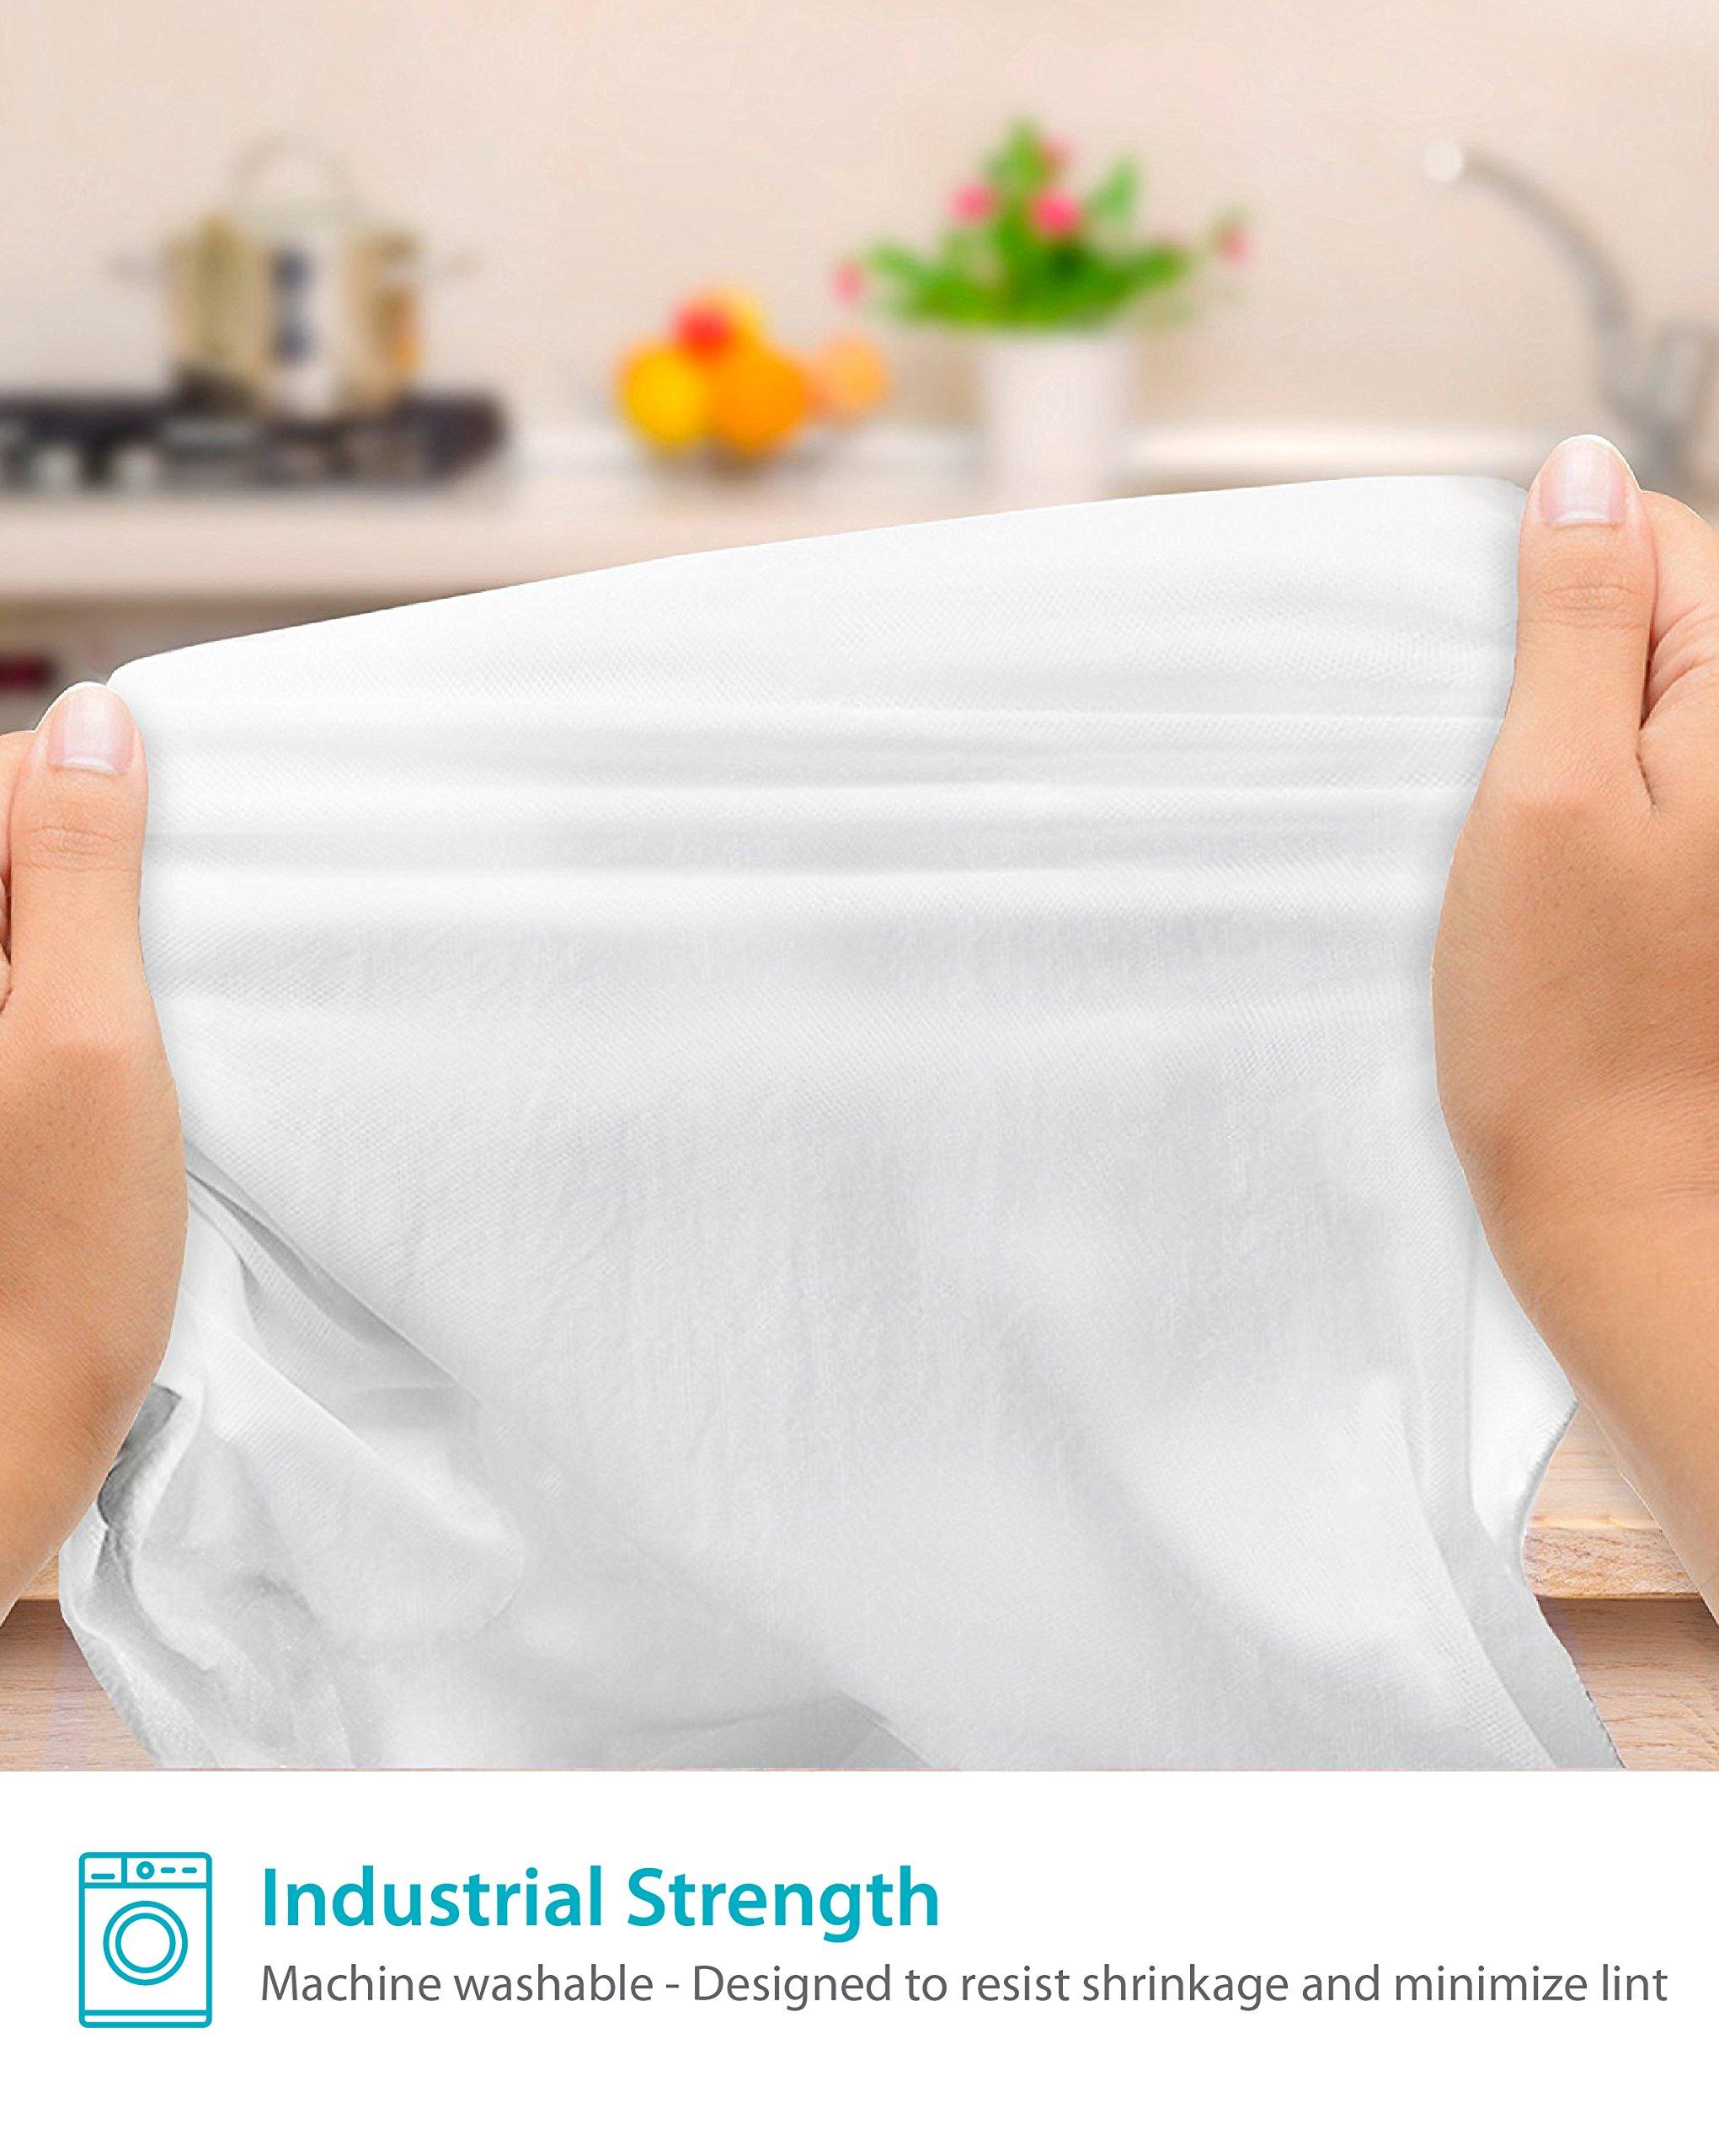 Zeppoli 12-Pack Flour Sack Towels - 31'' x 31'' Kitchen Towels - Absorbent White Dish Towels - 100% Ring Spun Cotton Bar Towels by Zeppoli (Image #5)